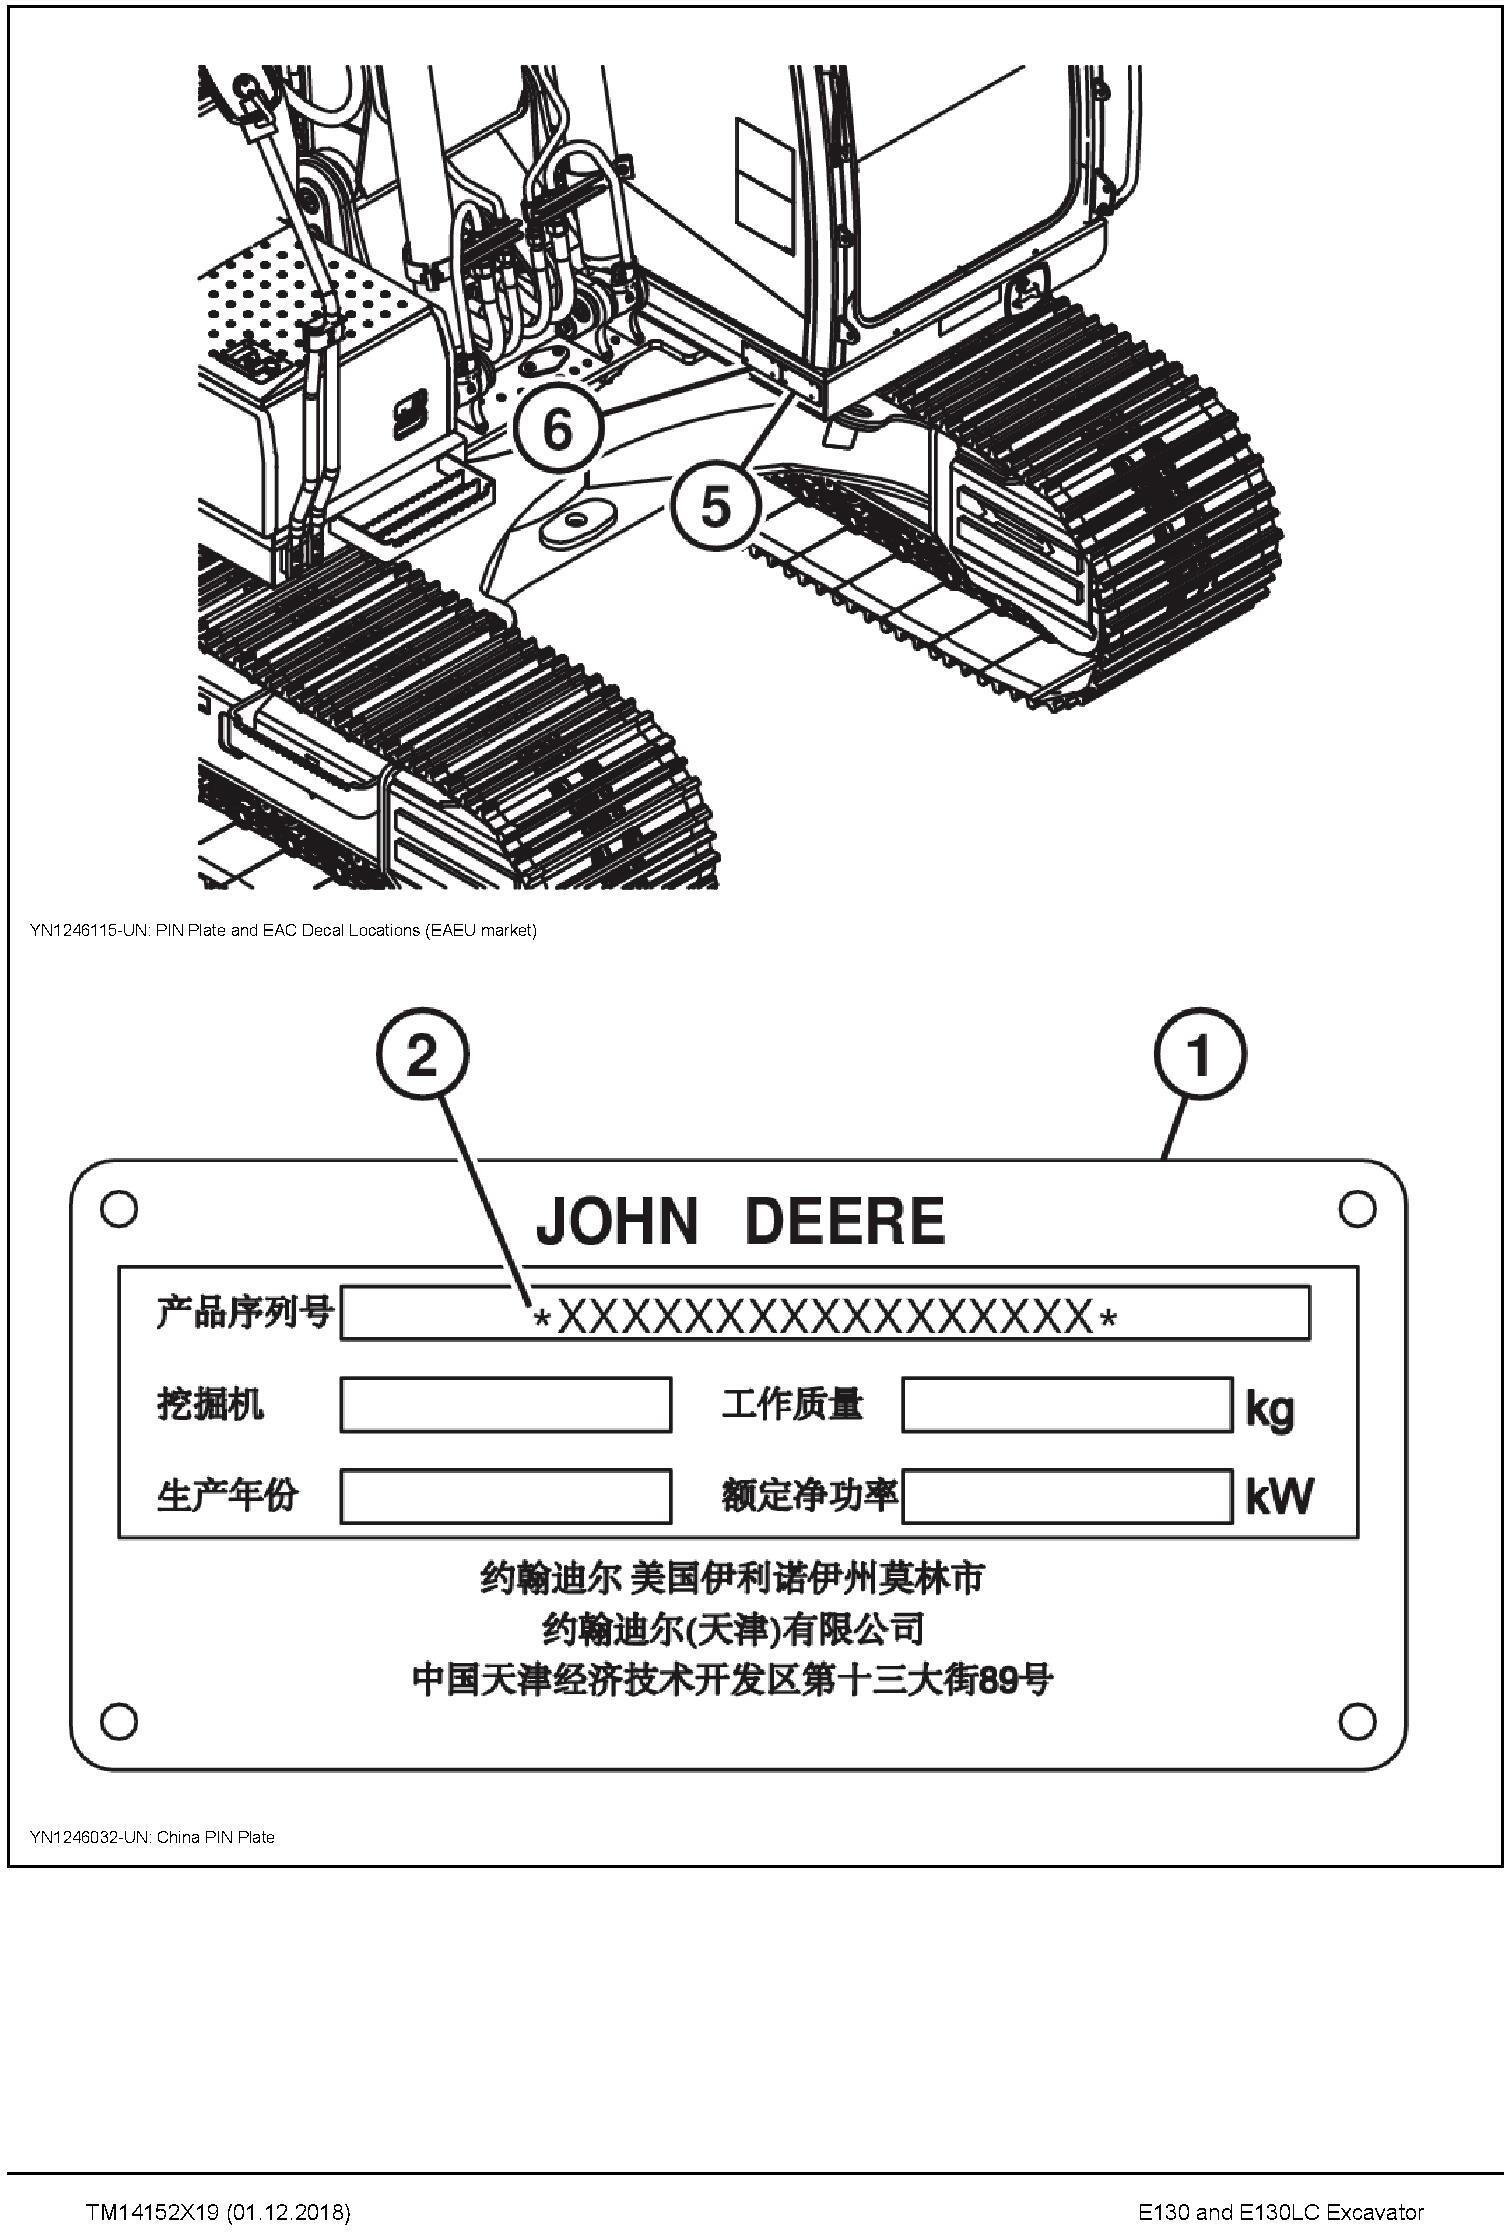 John Deere E130, E130LC (SN.from D300013) Excavator Operation & Test Technical Manual (TM14152X19) - 1